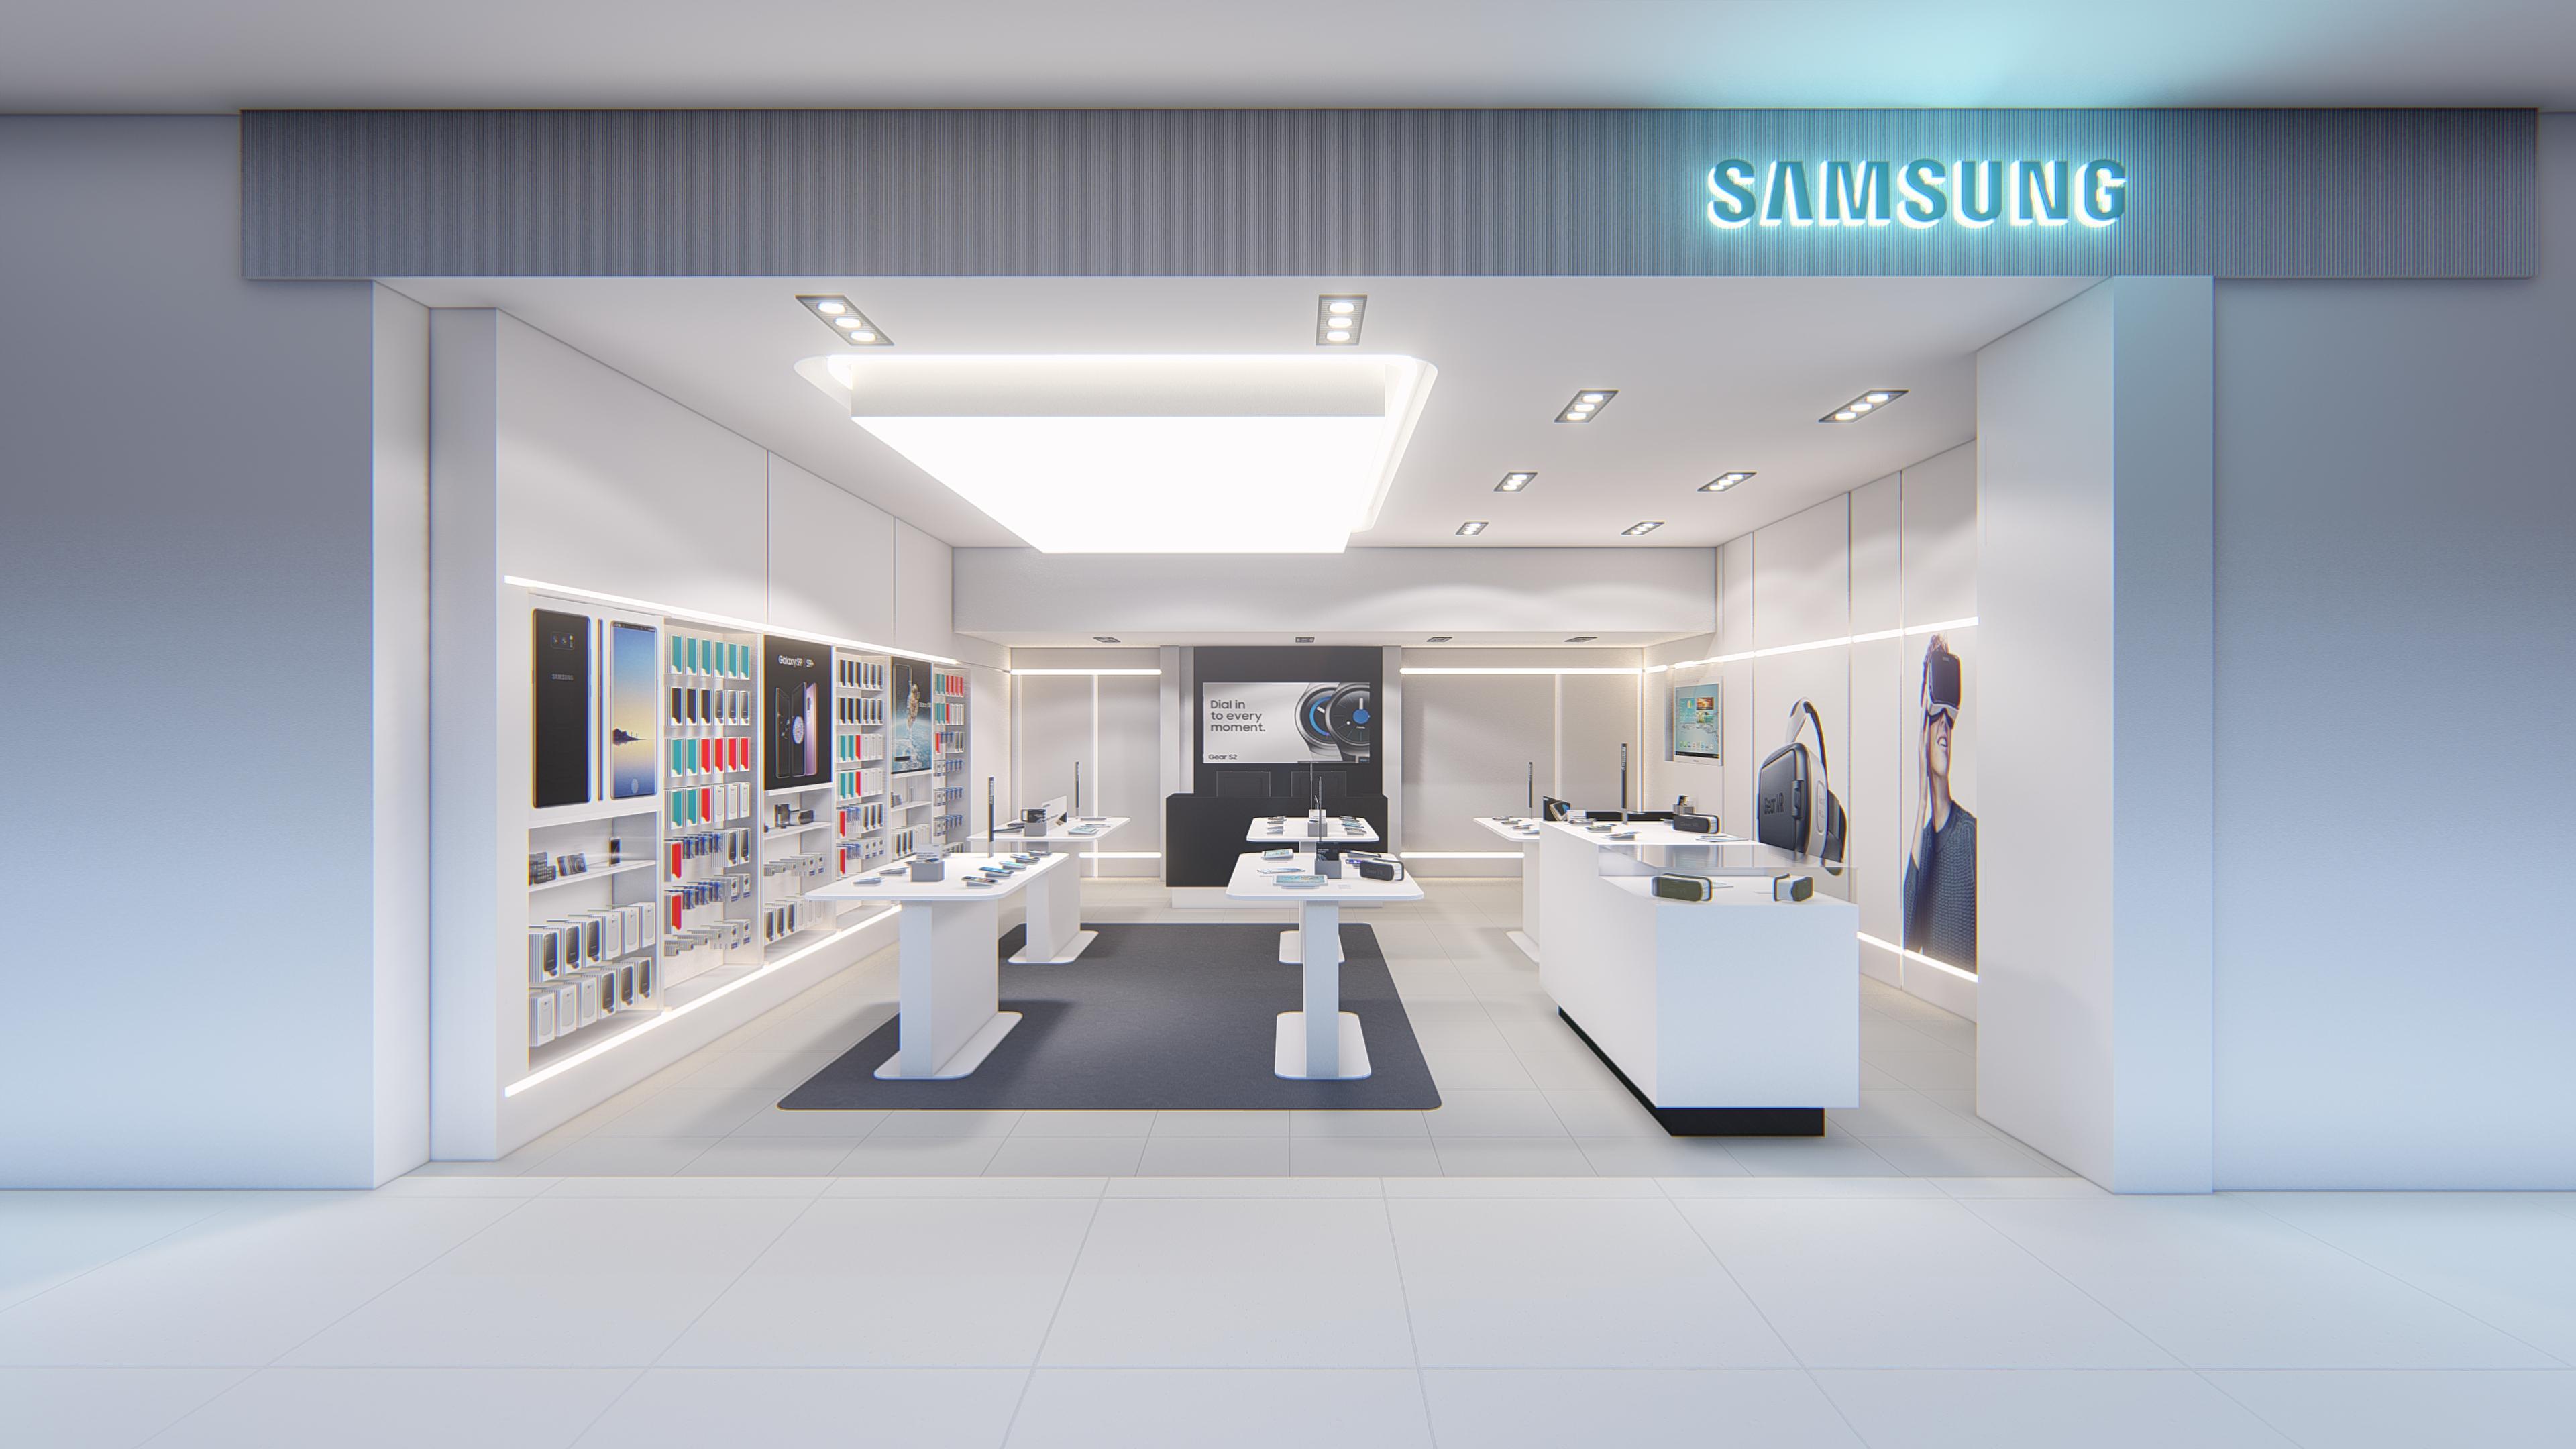 Samsung Cuiabá